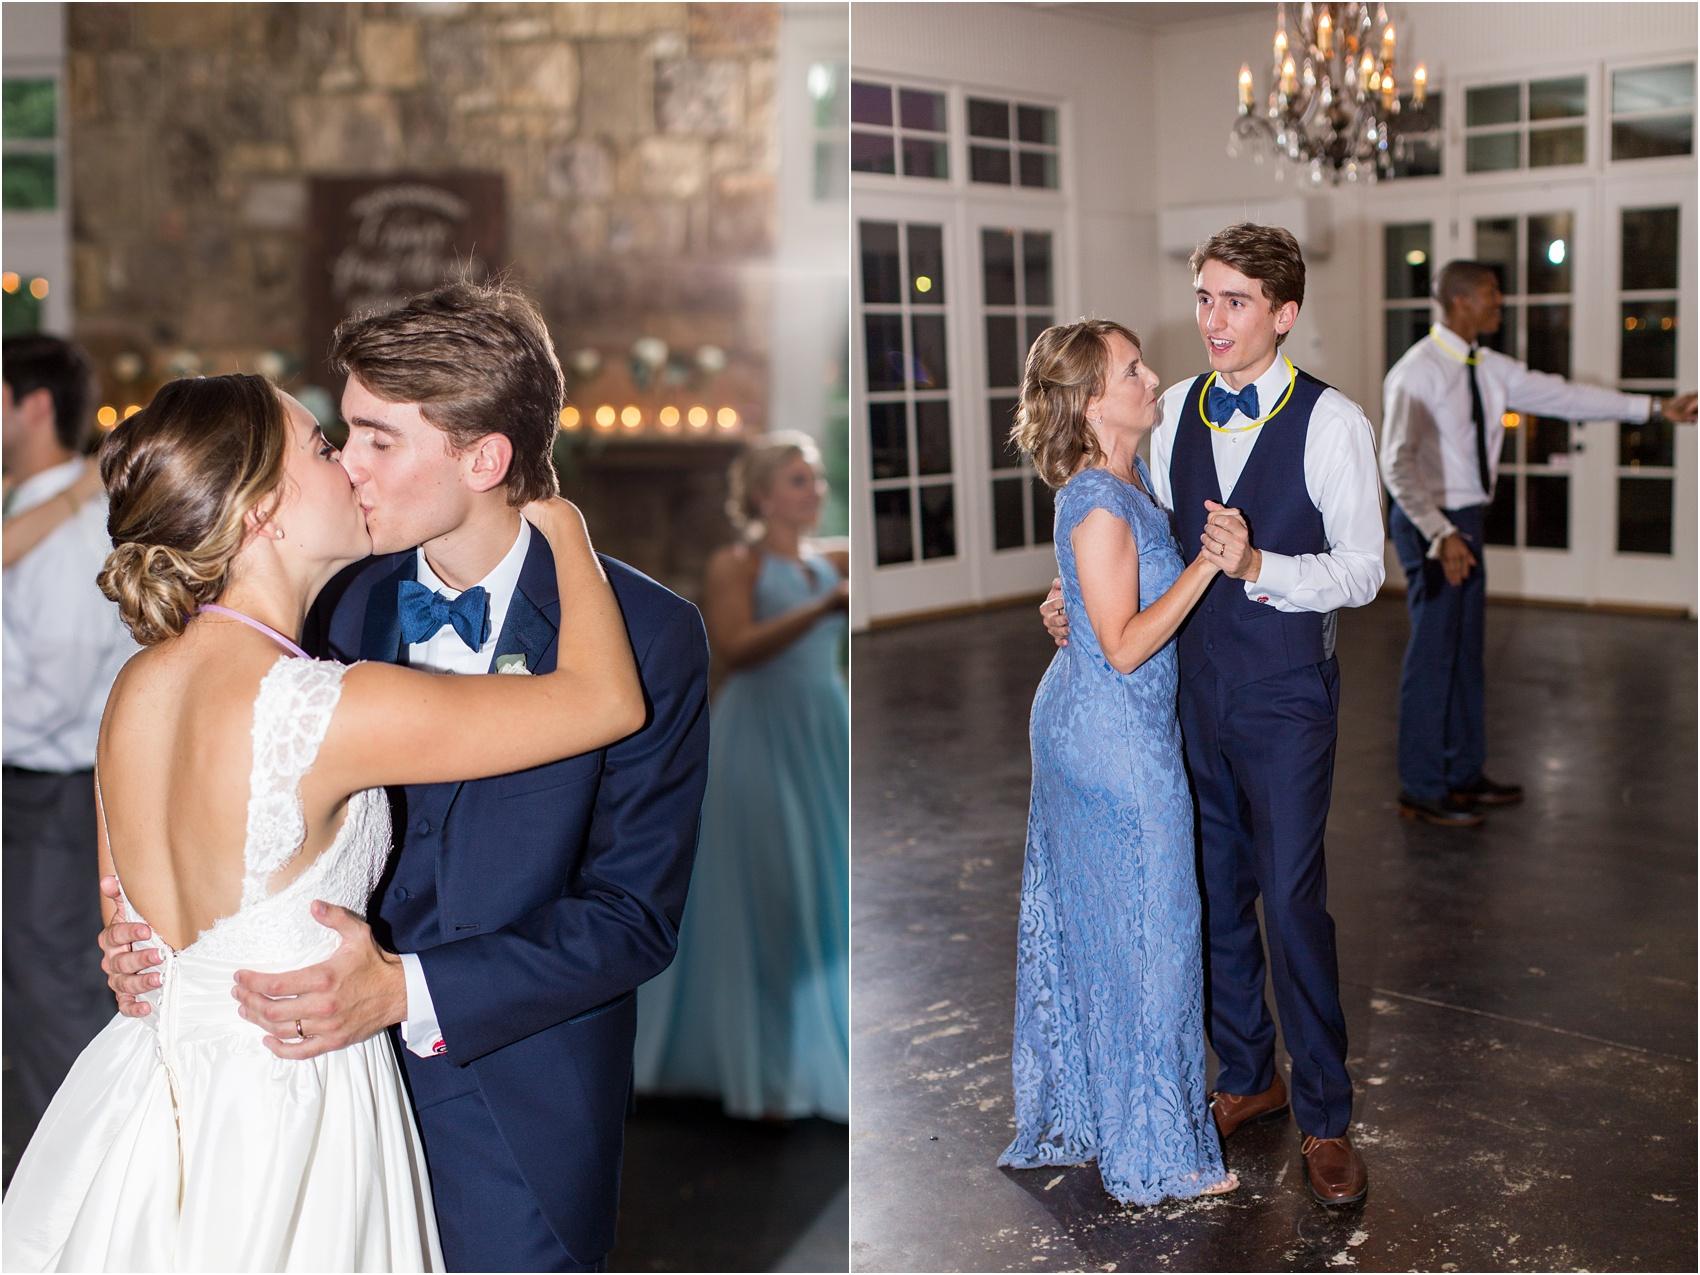 Savannah Eve Photography- Sigl-Adams Wedding- Sneak Peek-86.jpg